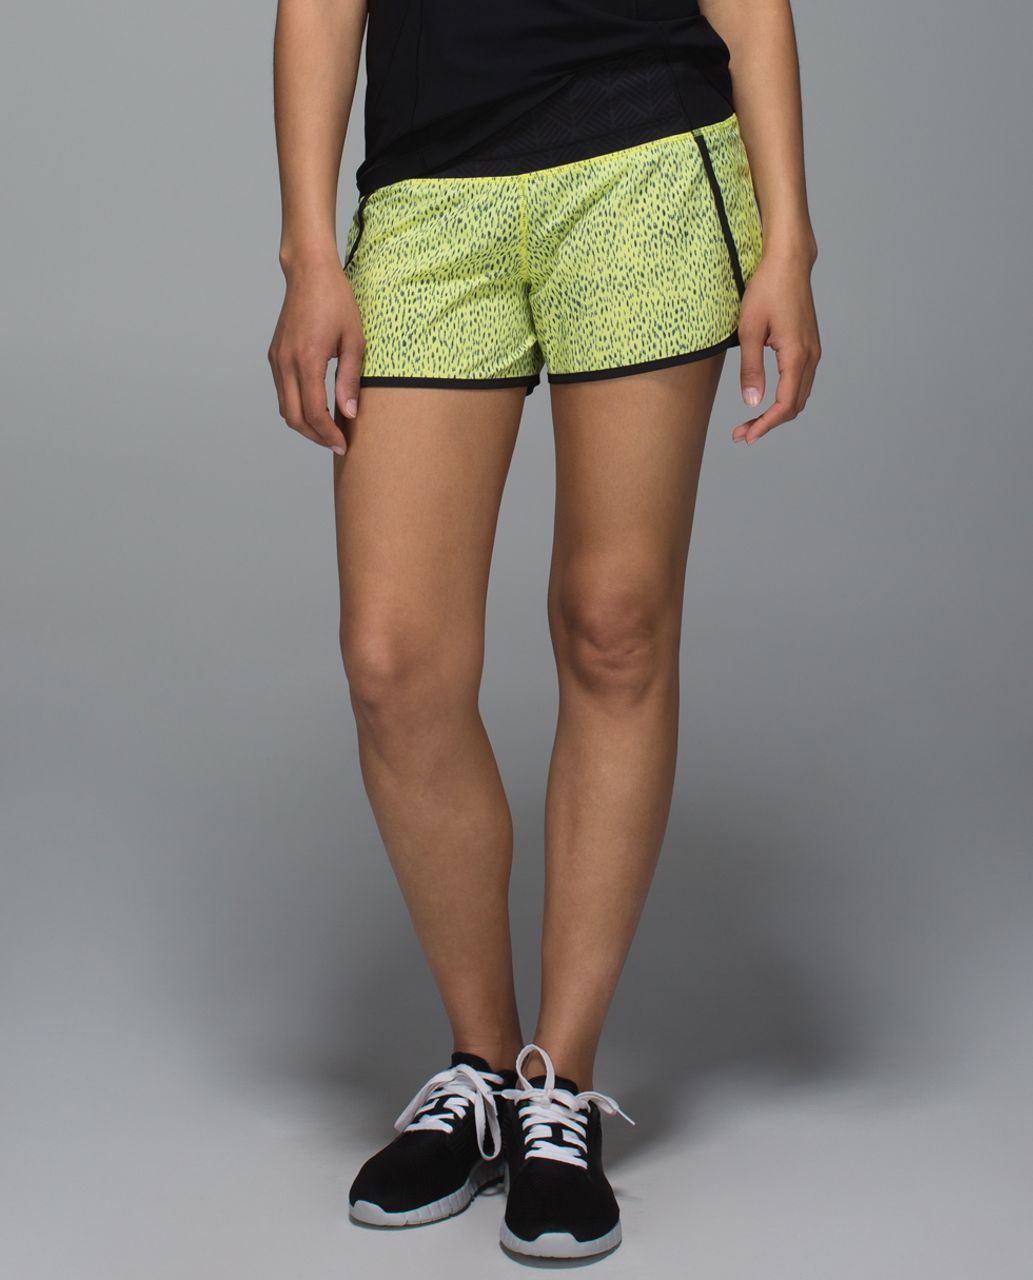 Lululemon Run Times Short *4-way Stretch - Dottie Dash Clarity Yellow Black / Black